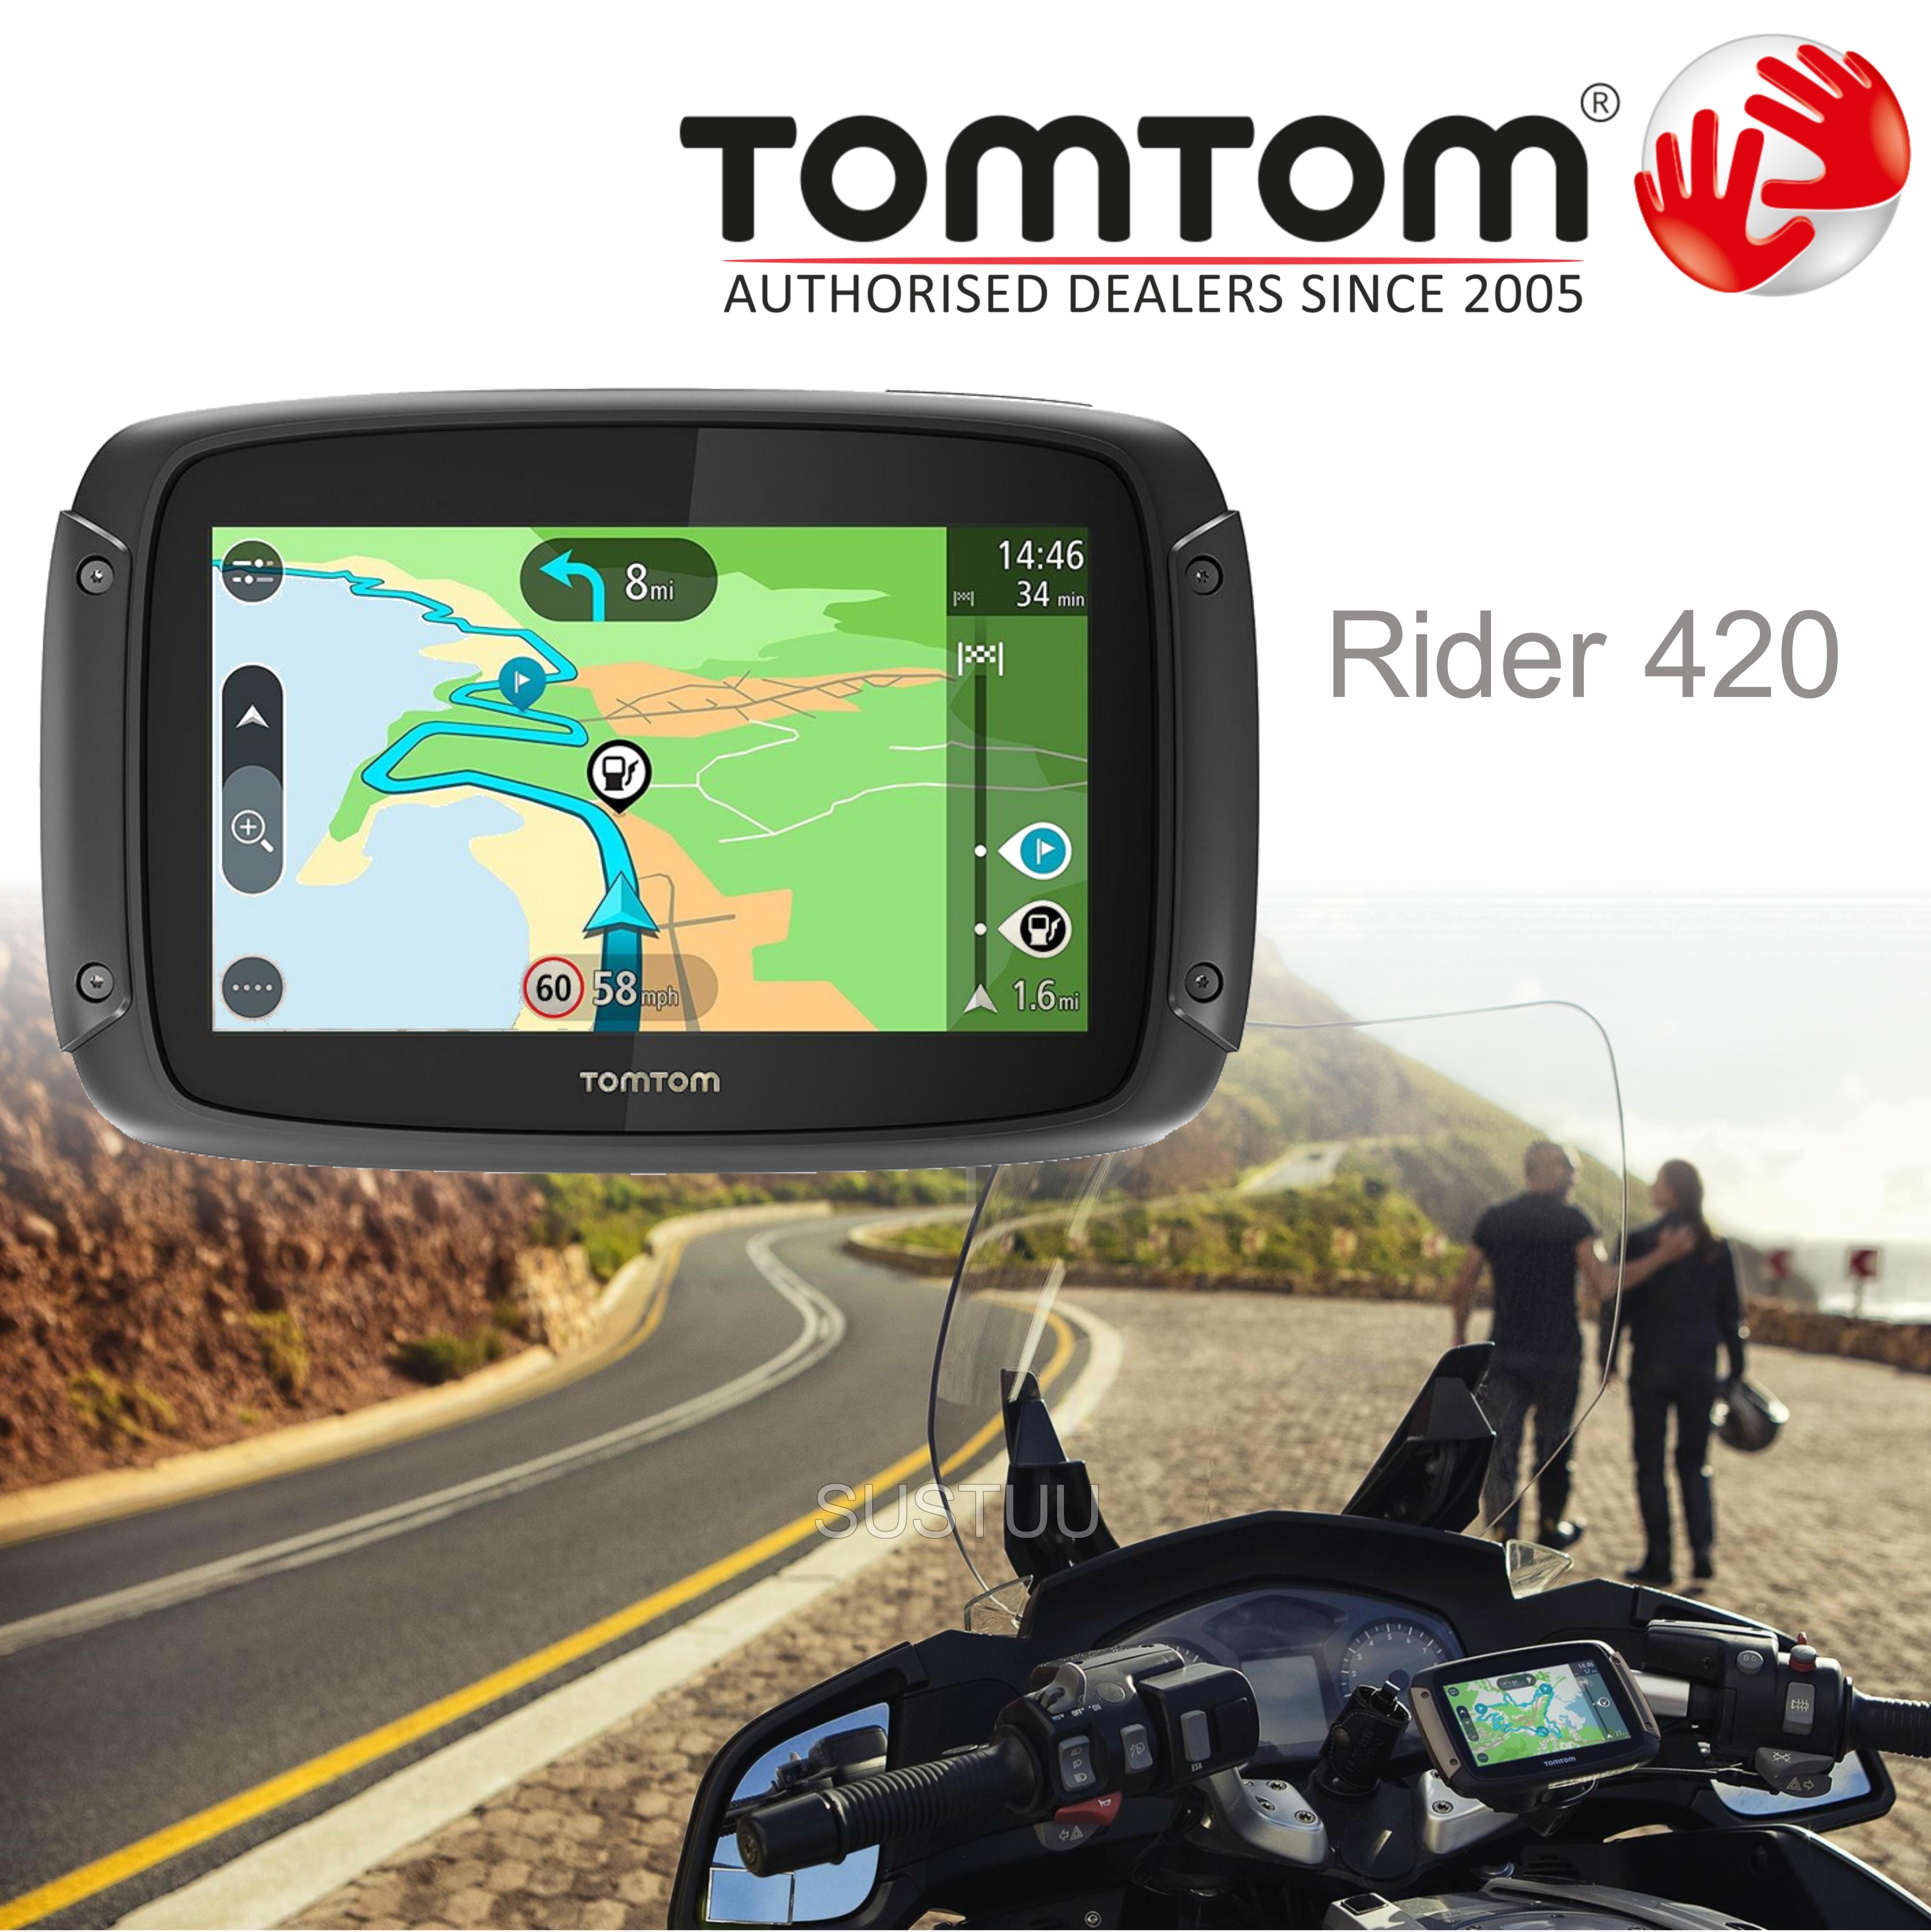 TomTom Rider 420 Motorcycle GPS-SatNav Navigation Bluetooth *Lifetime EU Map+Traffic+Camera Alerts